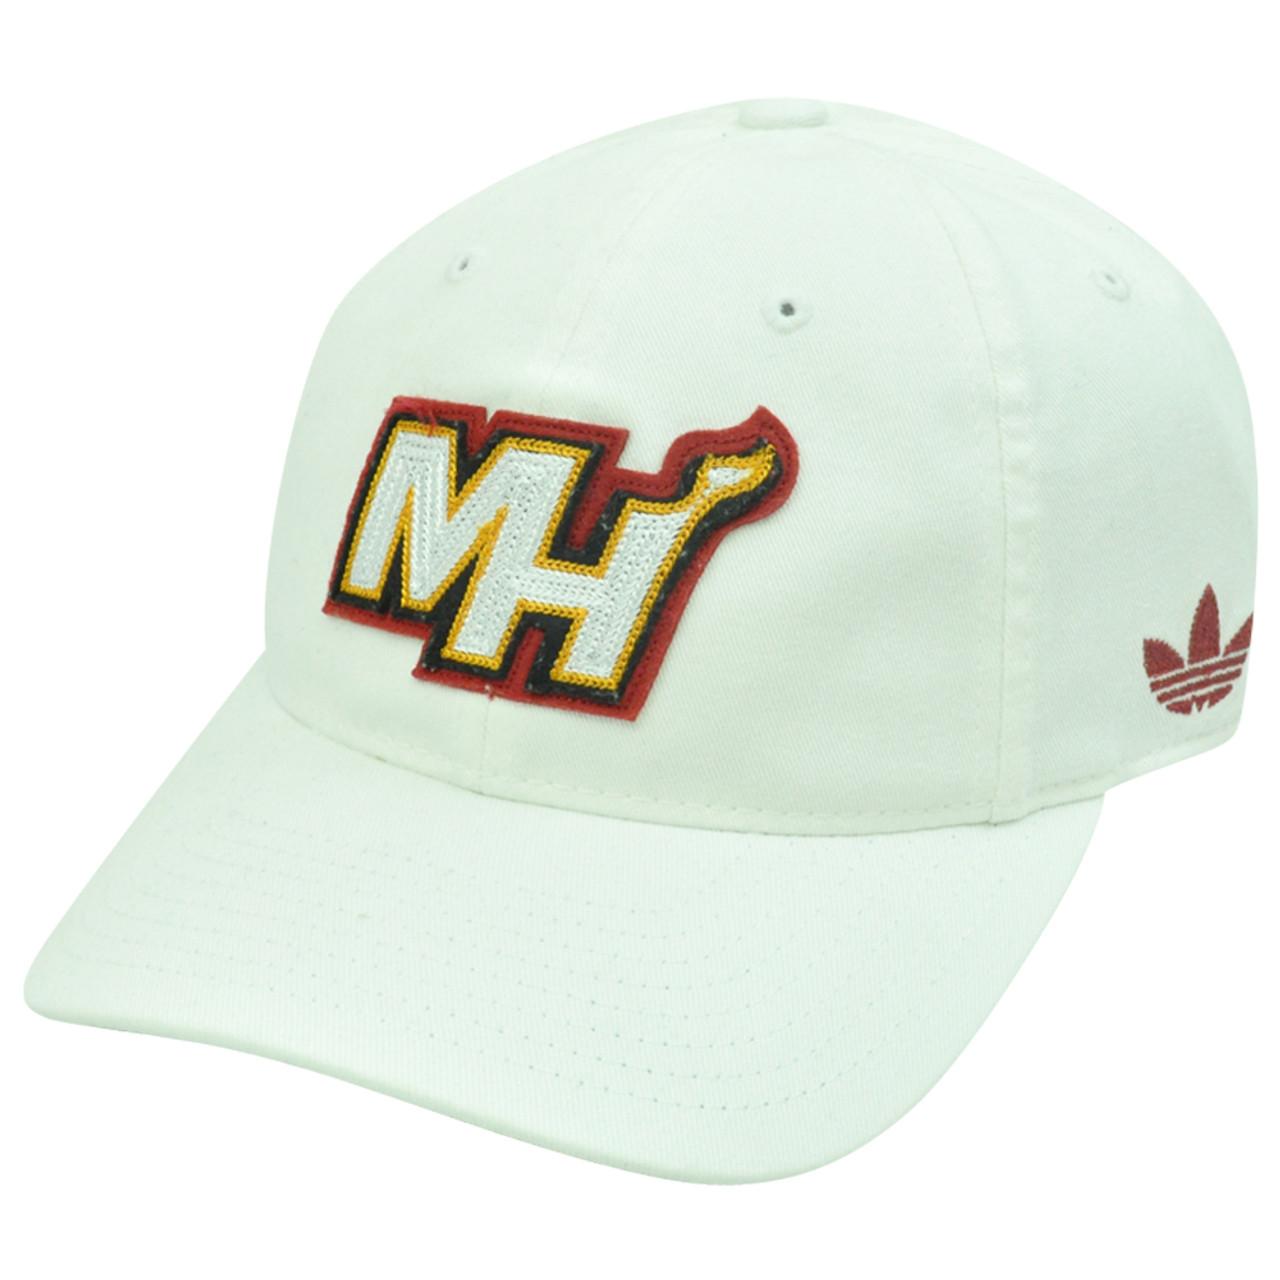 NBA Miami Heat Adidas ER23 Slope L XL Size Flex Fit Stretch Garment Wash Hat 270dc7bc6